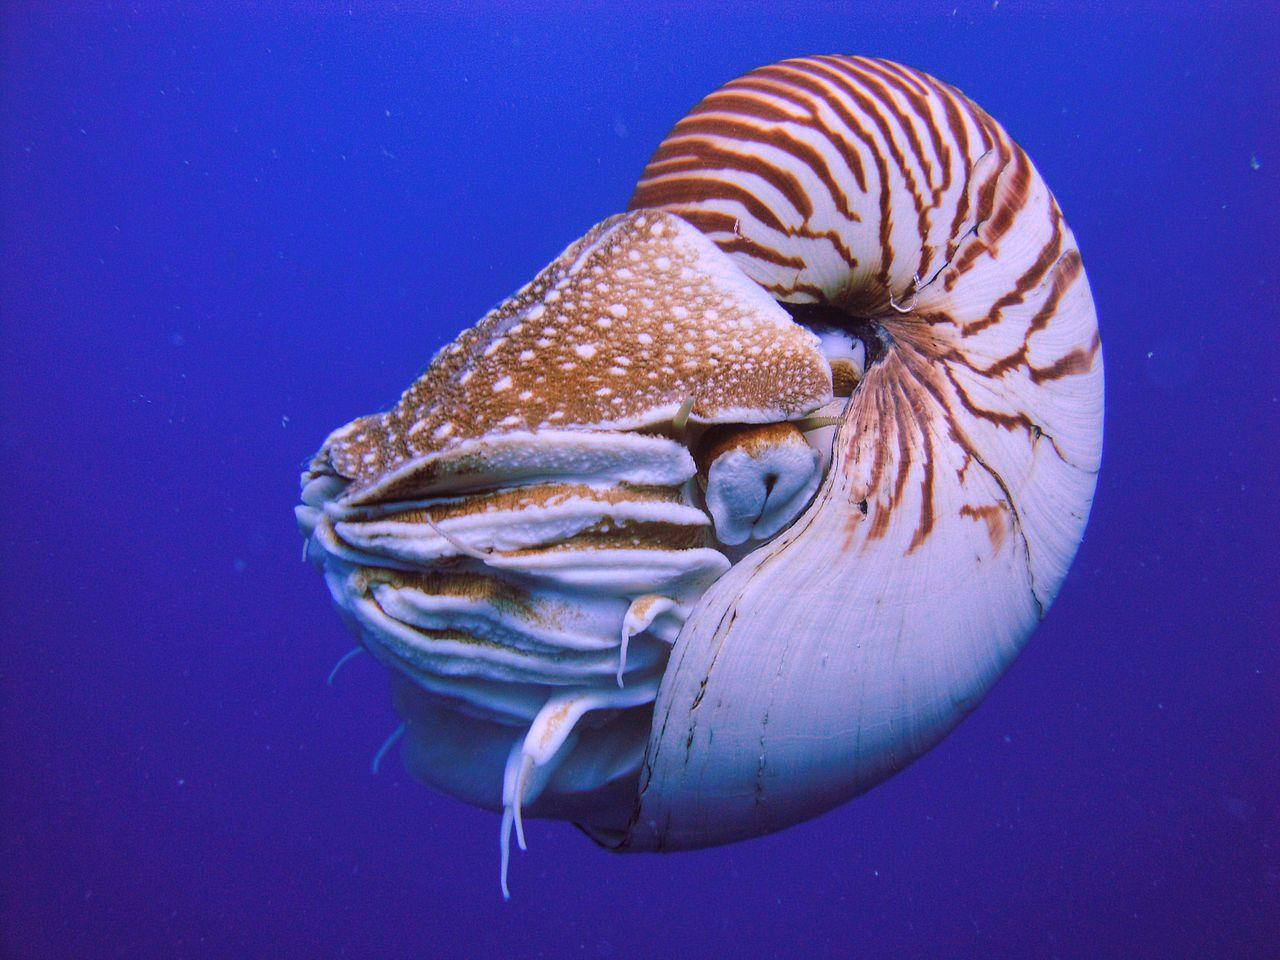 https://upload.wikimedia.org/wikipedia/commons/thumb/d/d5/Nautilus_Palau.JPG/1280px-Nautilus_Palau.JPG